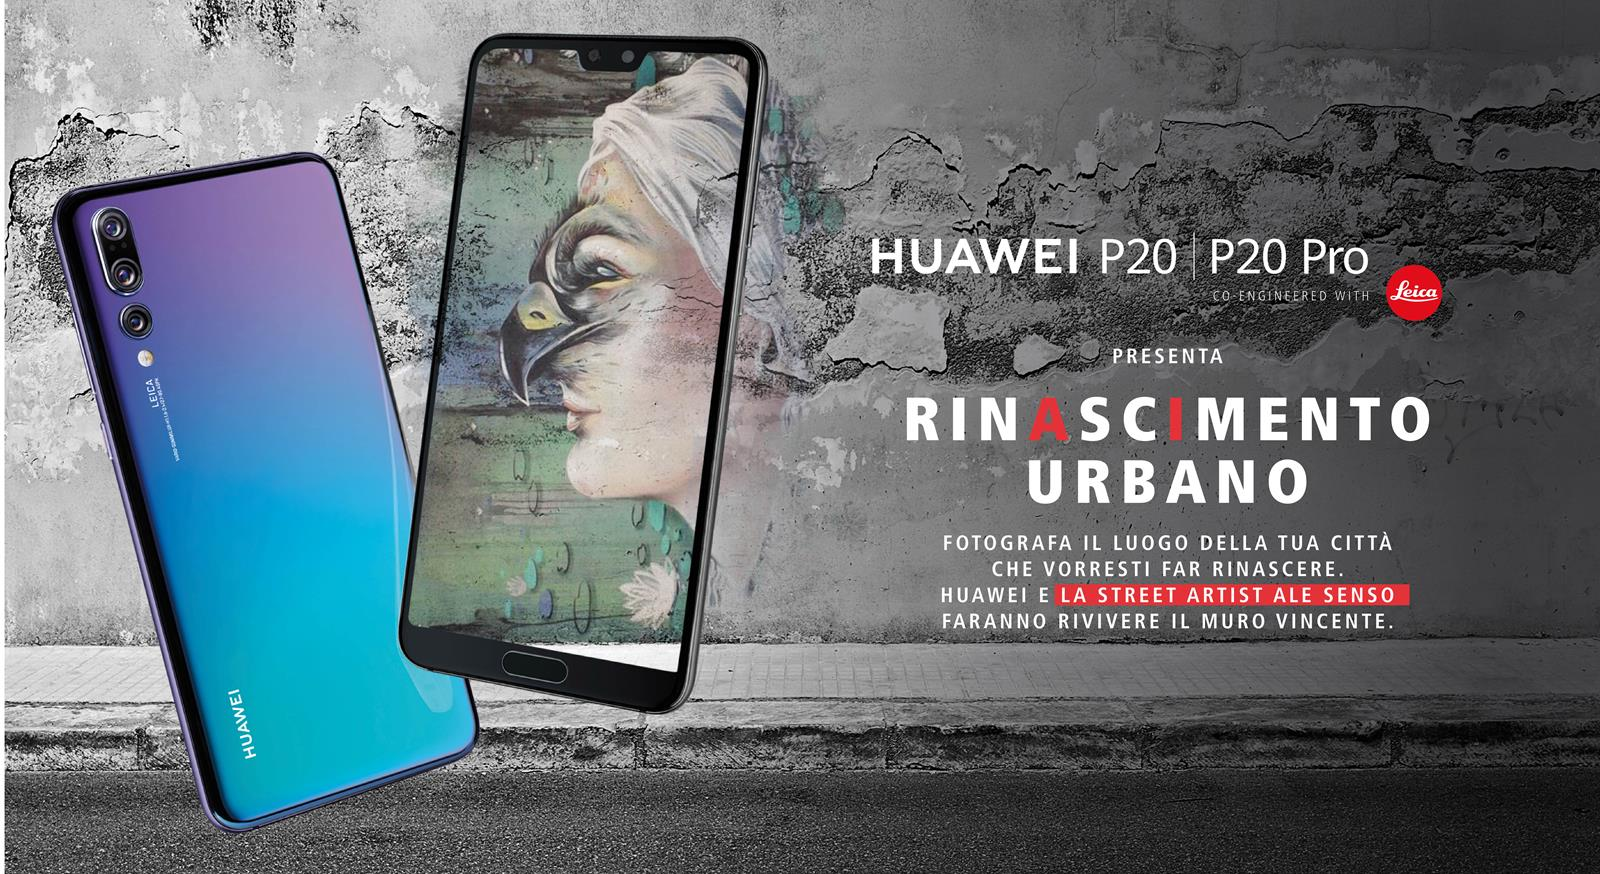 Huawei contest street art